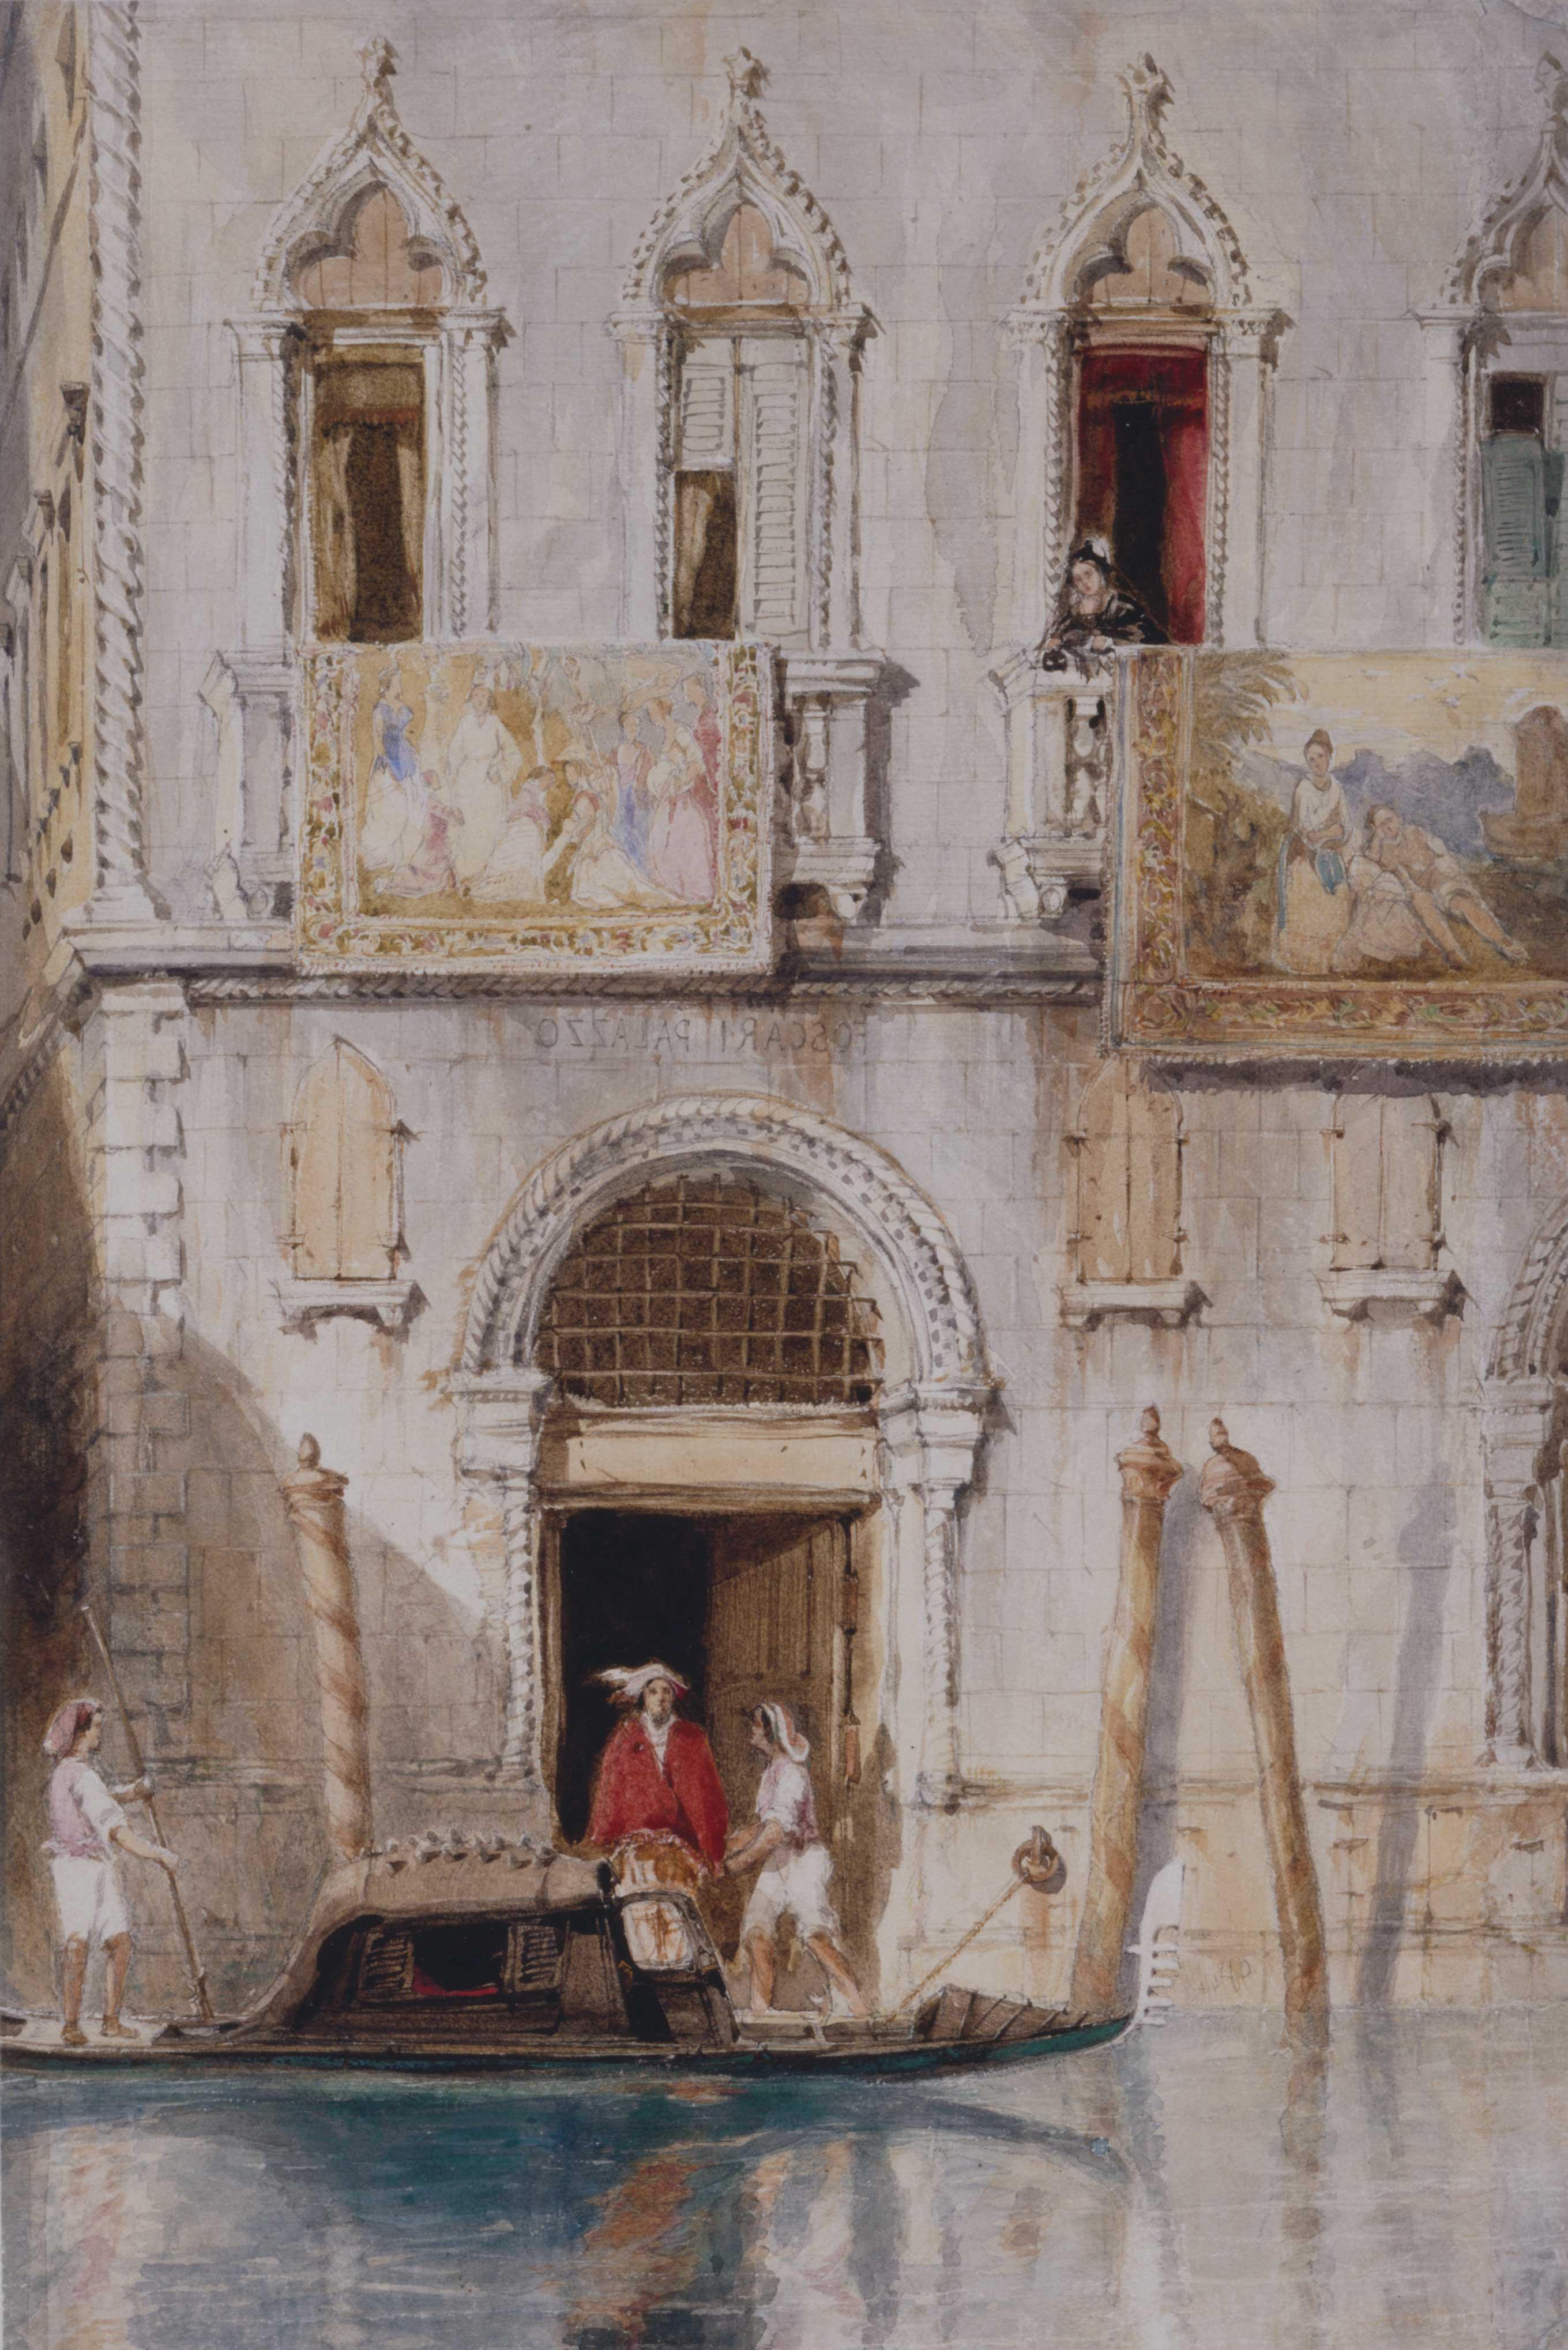 The steps of the Palazzo Foscari